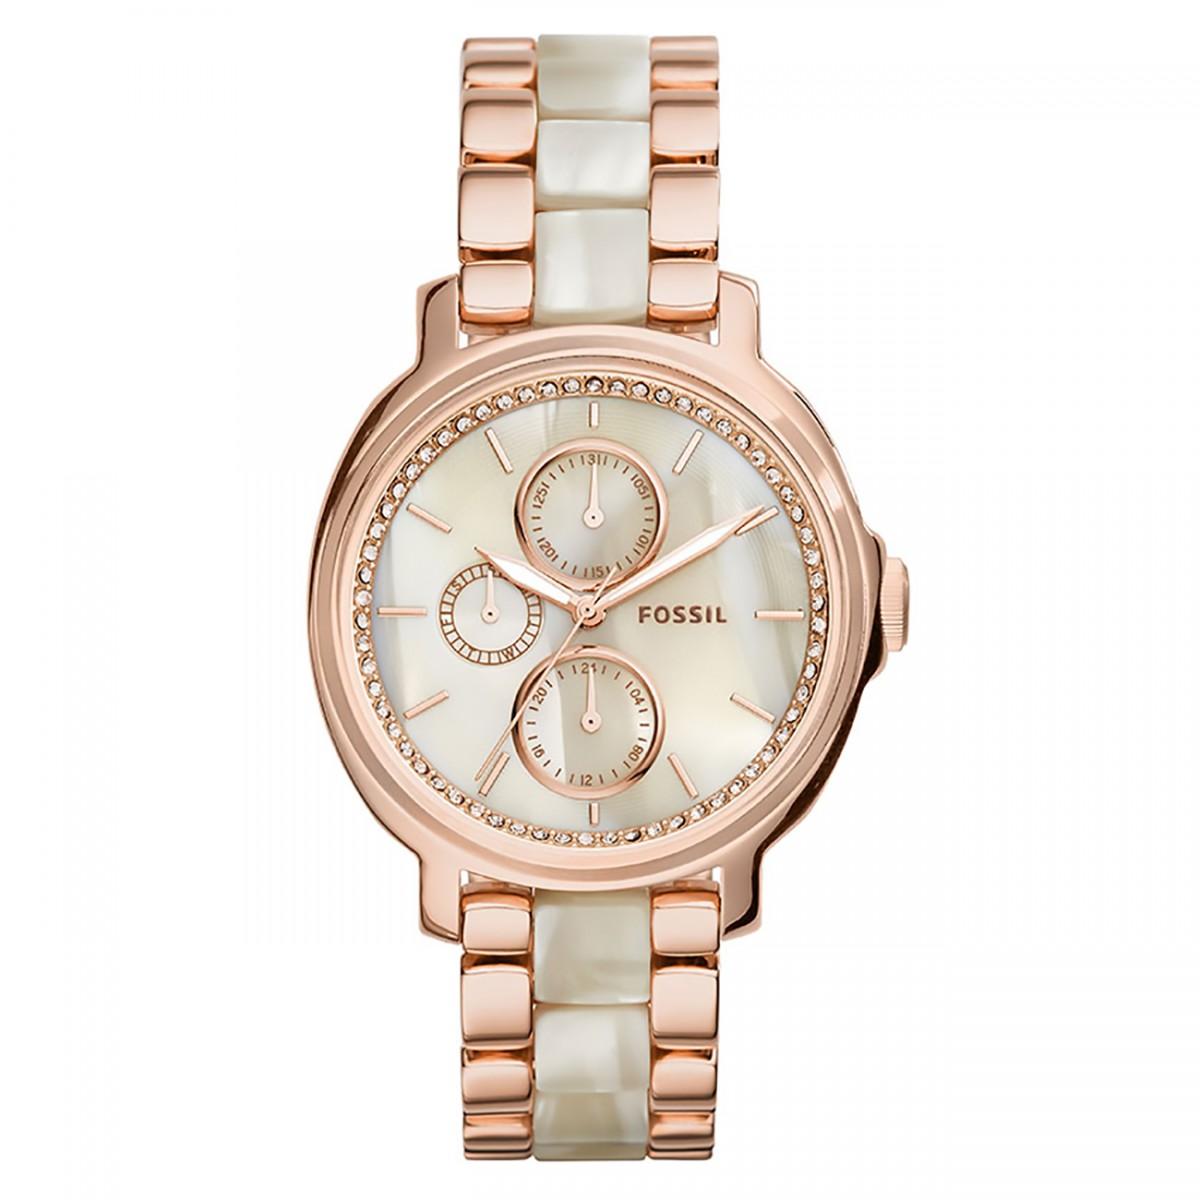 79579ddd2ee Compre Relógio Fossil Chelsey em 10X